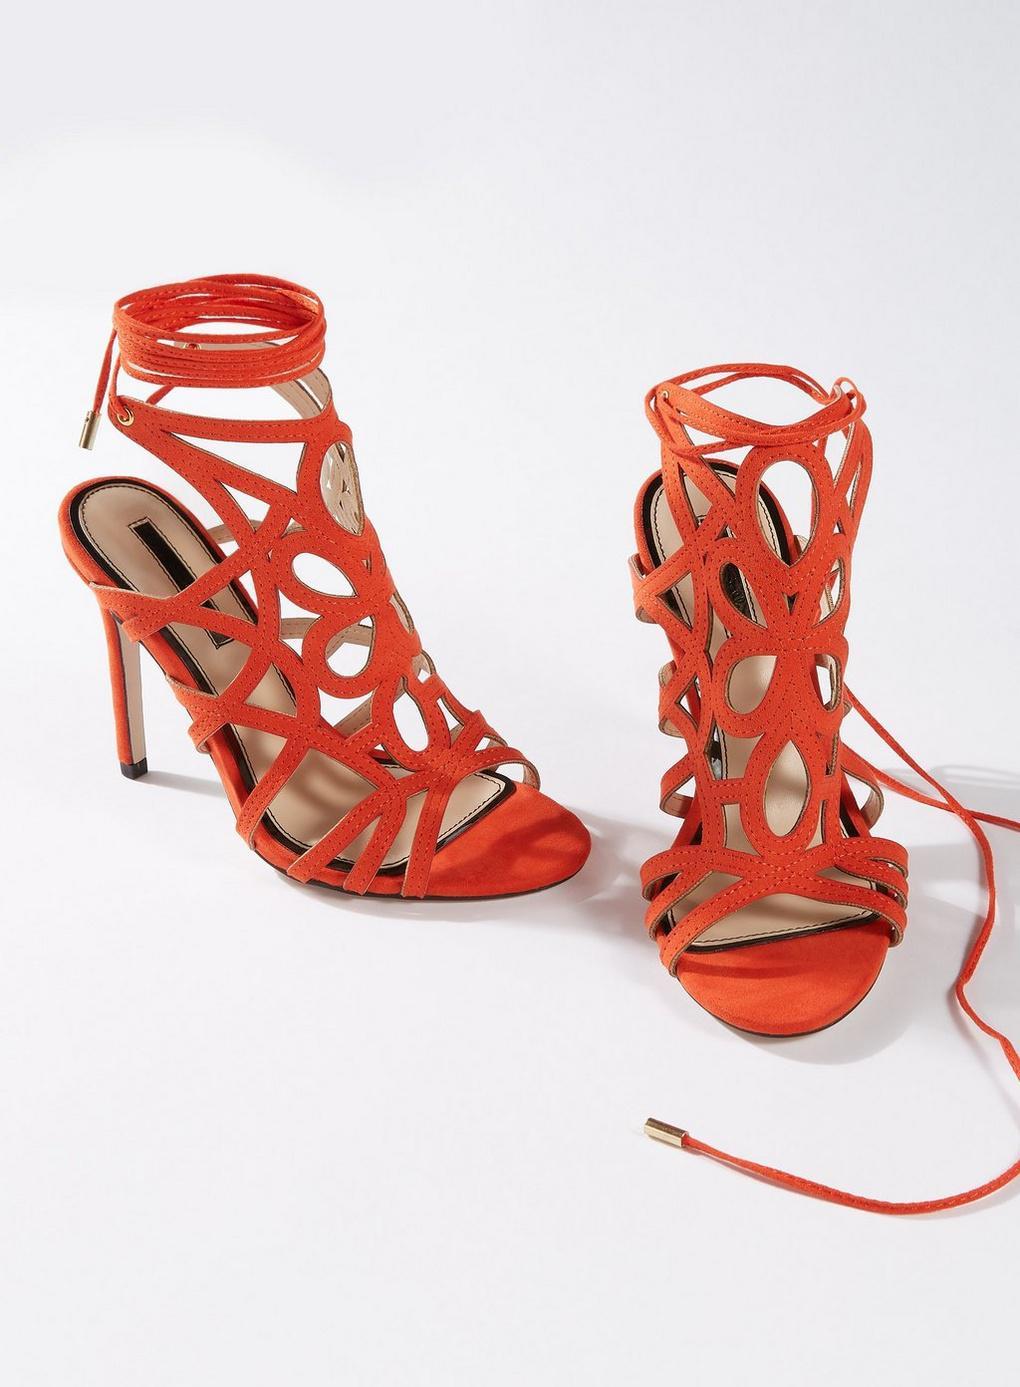 45fe3b941e0b Miss Selfridge - Red Coral Hun Caged Stiletto Heeled Sandals - Lyst. View  fullscreen